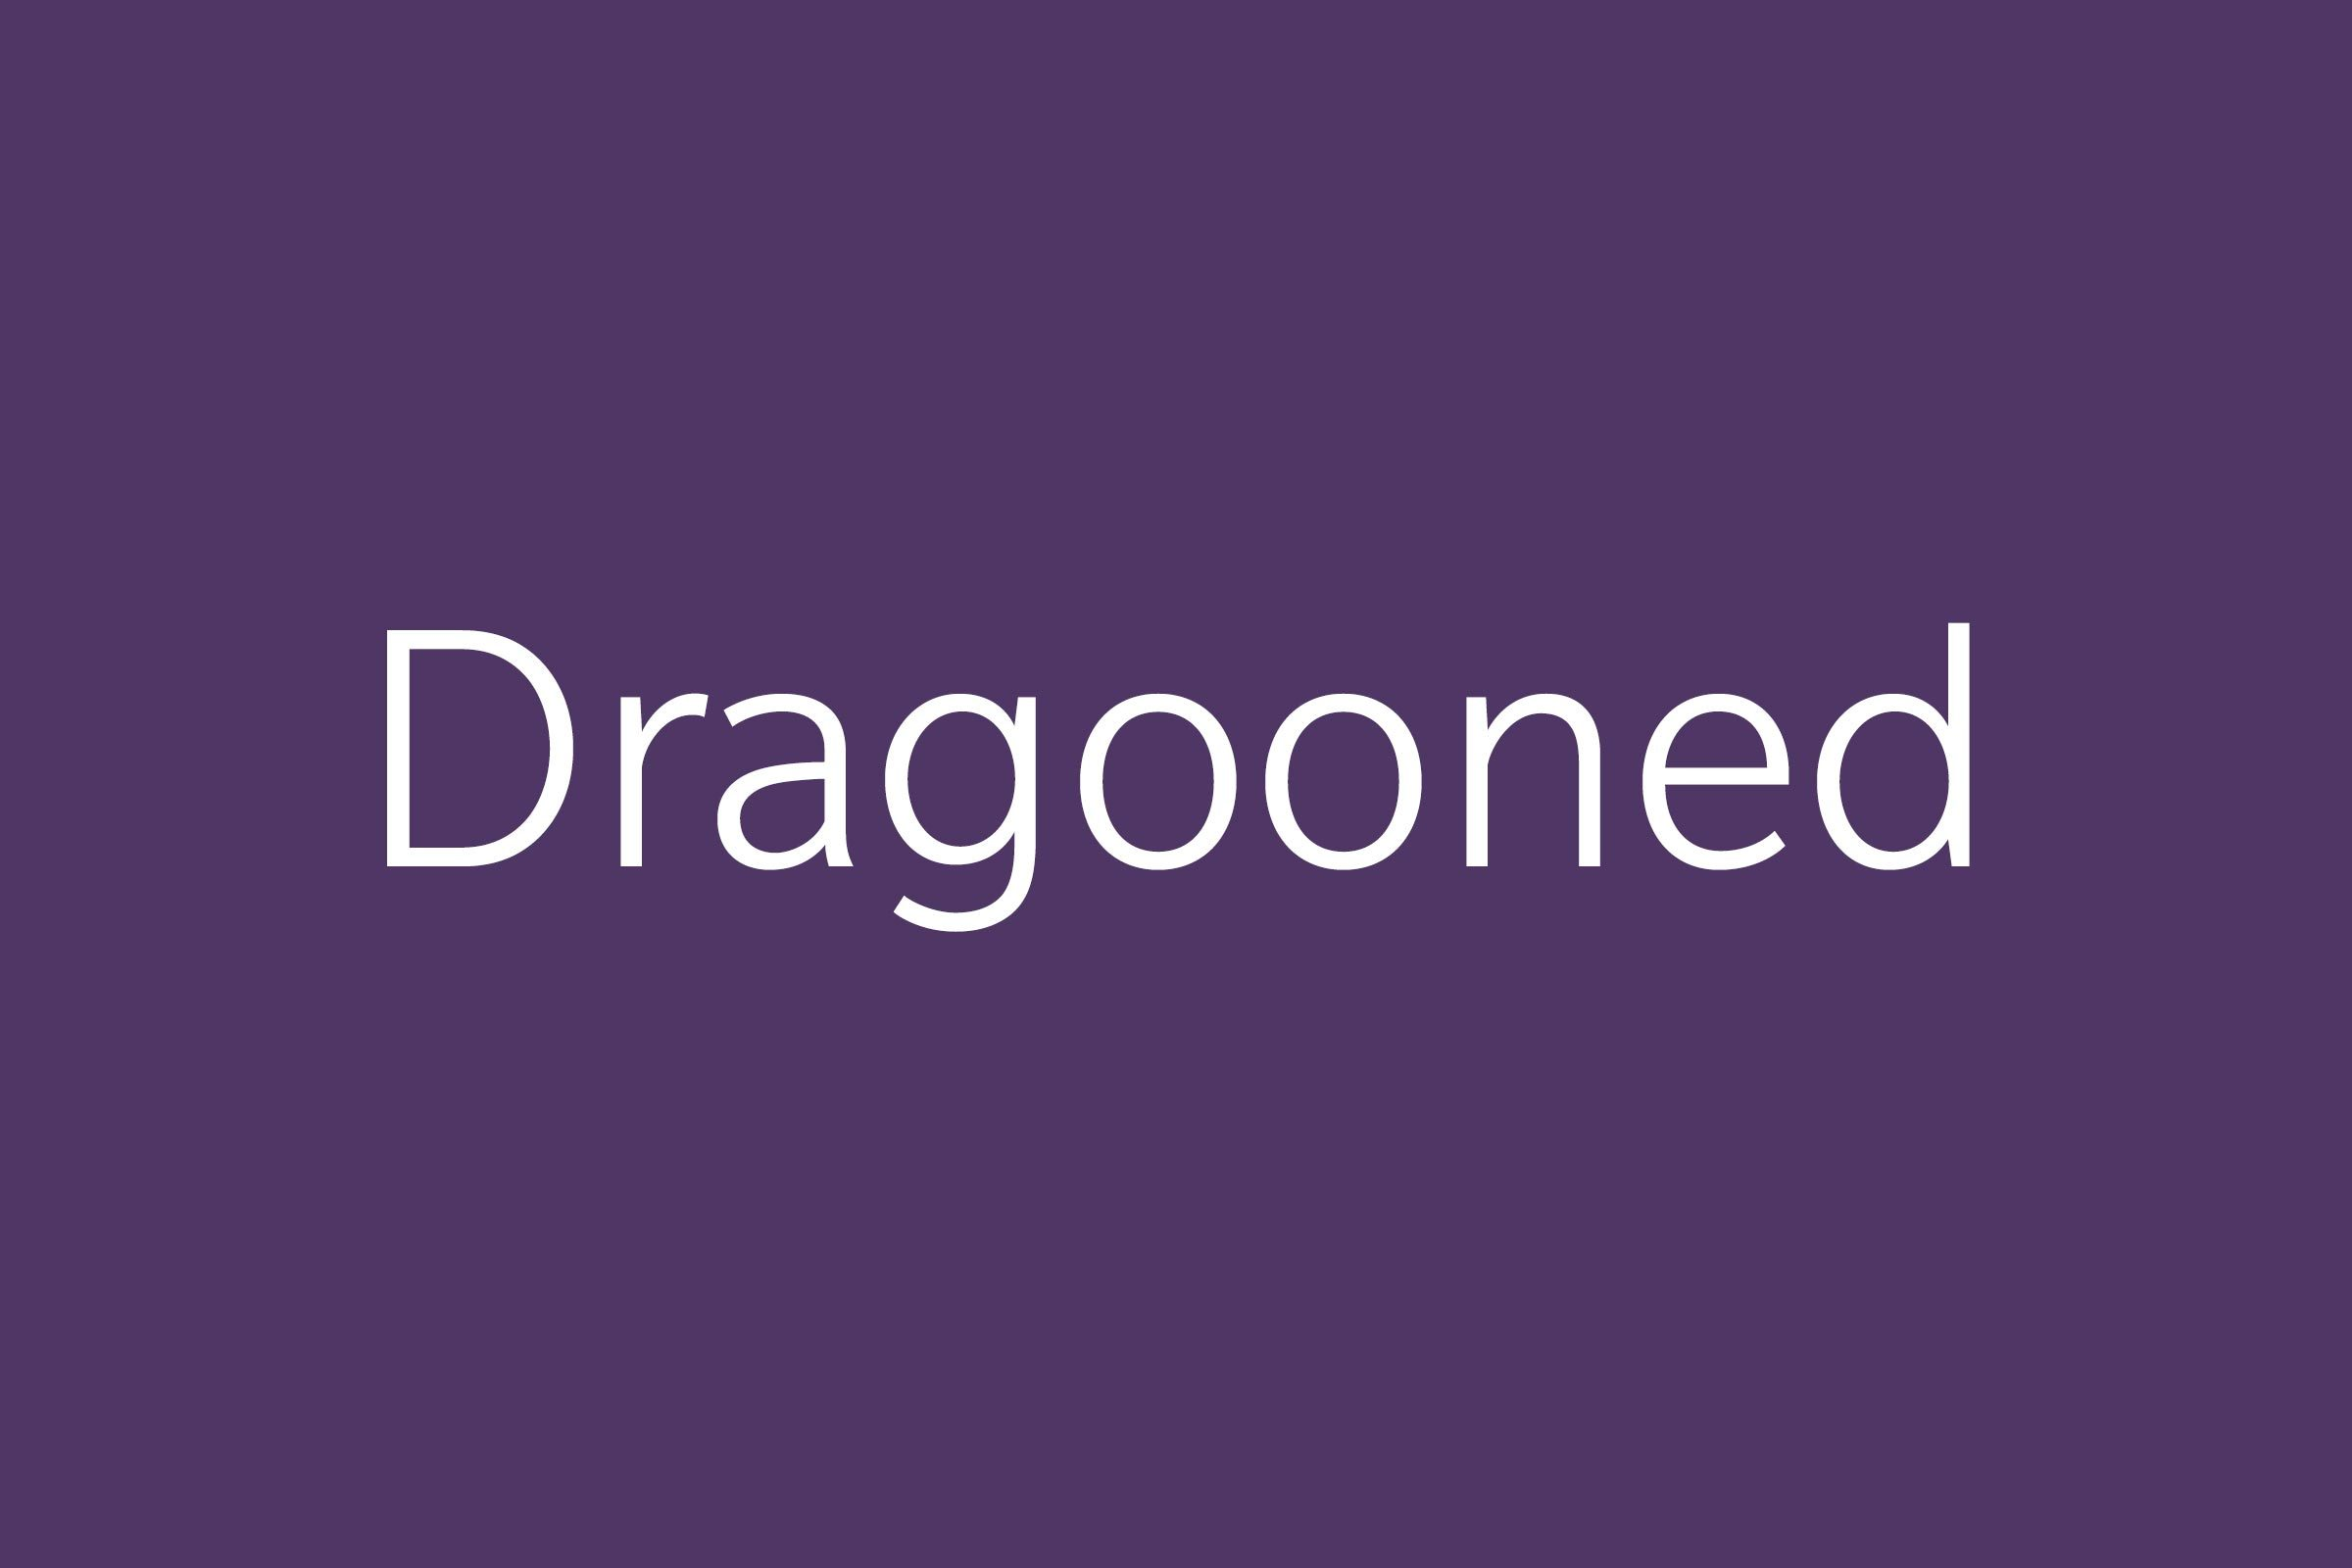 Dragooned